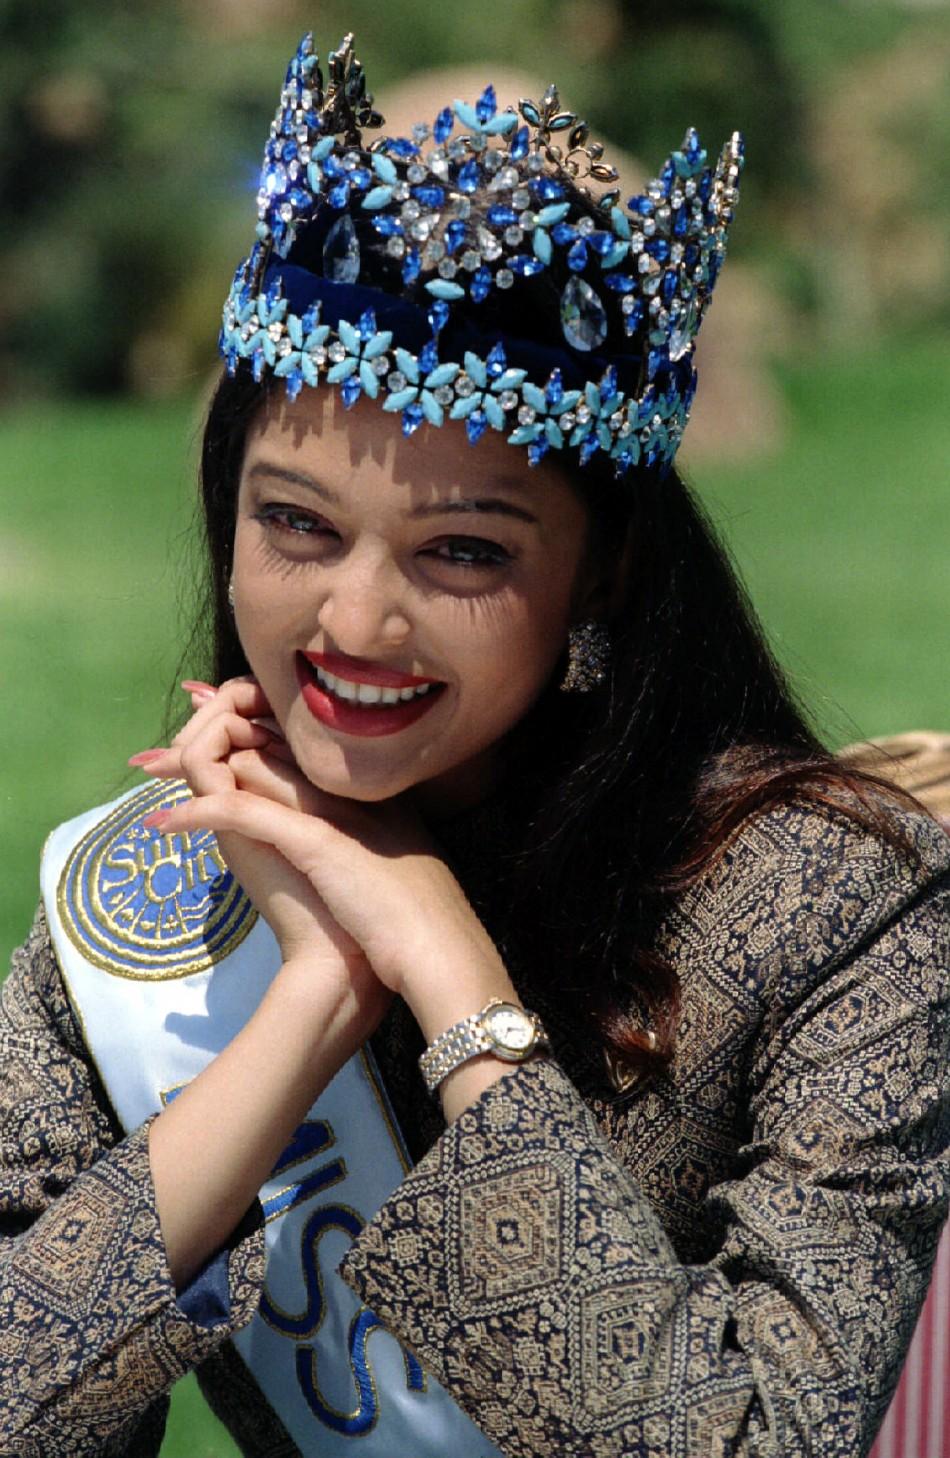 Apologise, but aishwarya rai as miss world are not